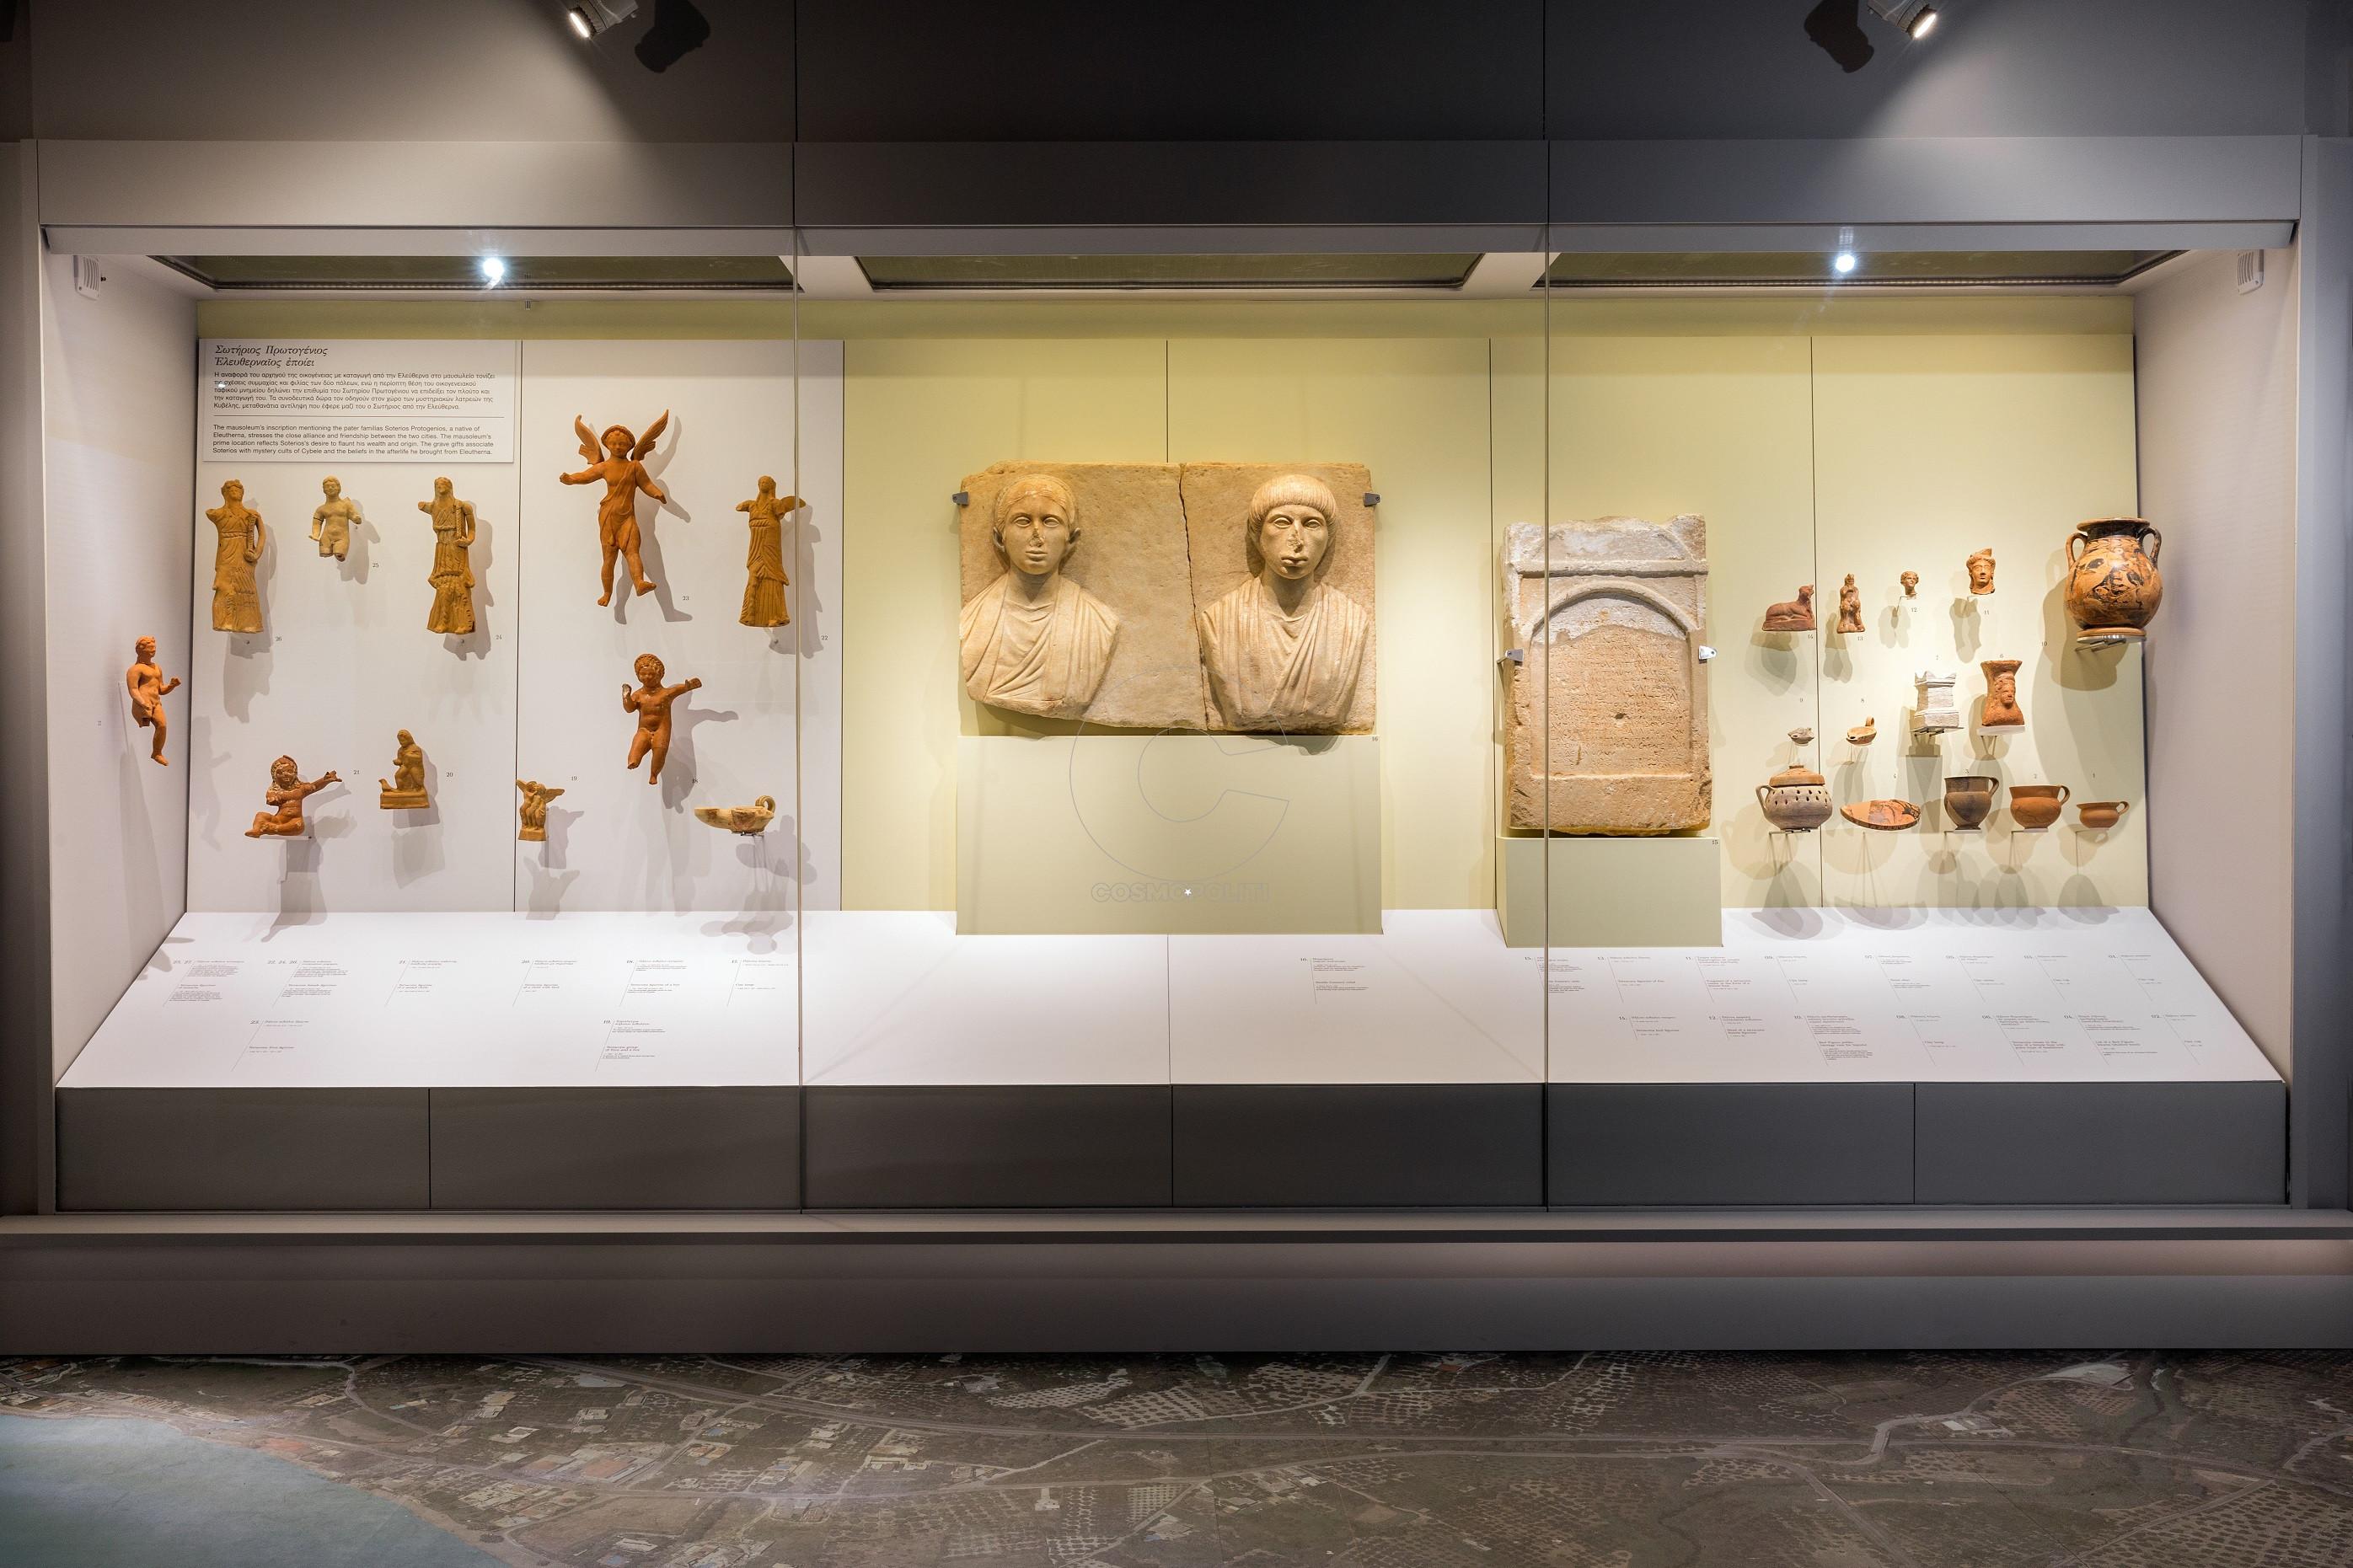 7_MUSEUM OF CYCLADIC ART© PHOTO PARIS TAVITIAN